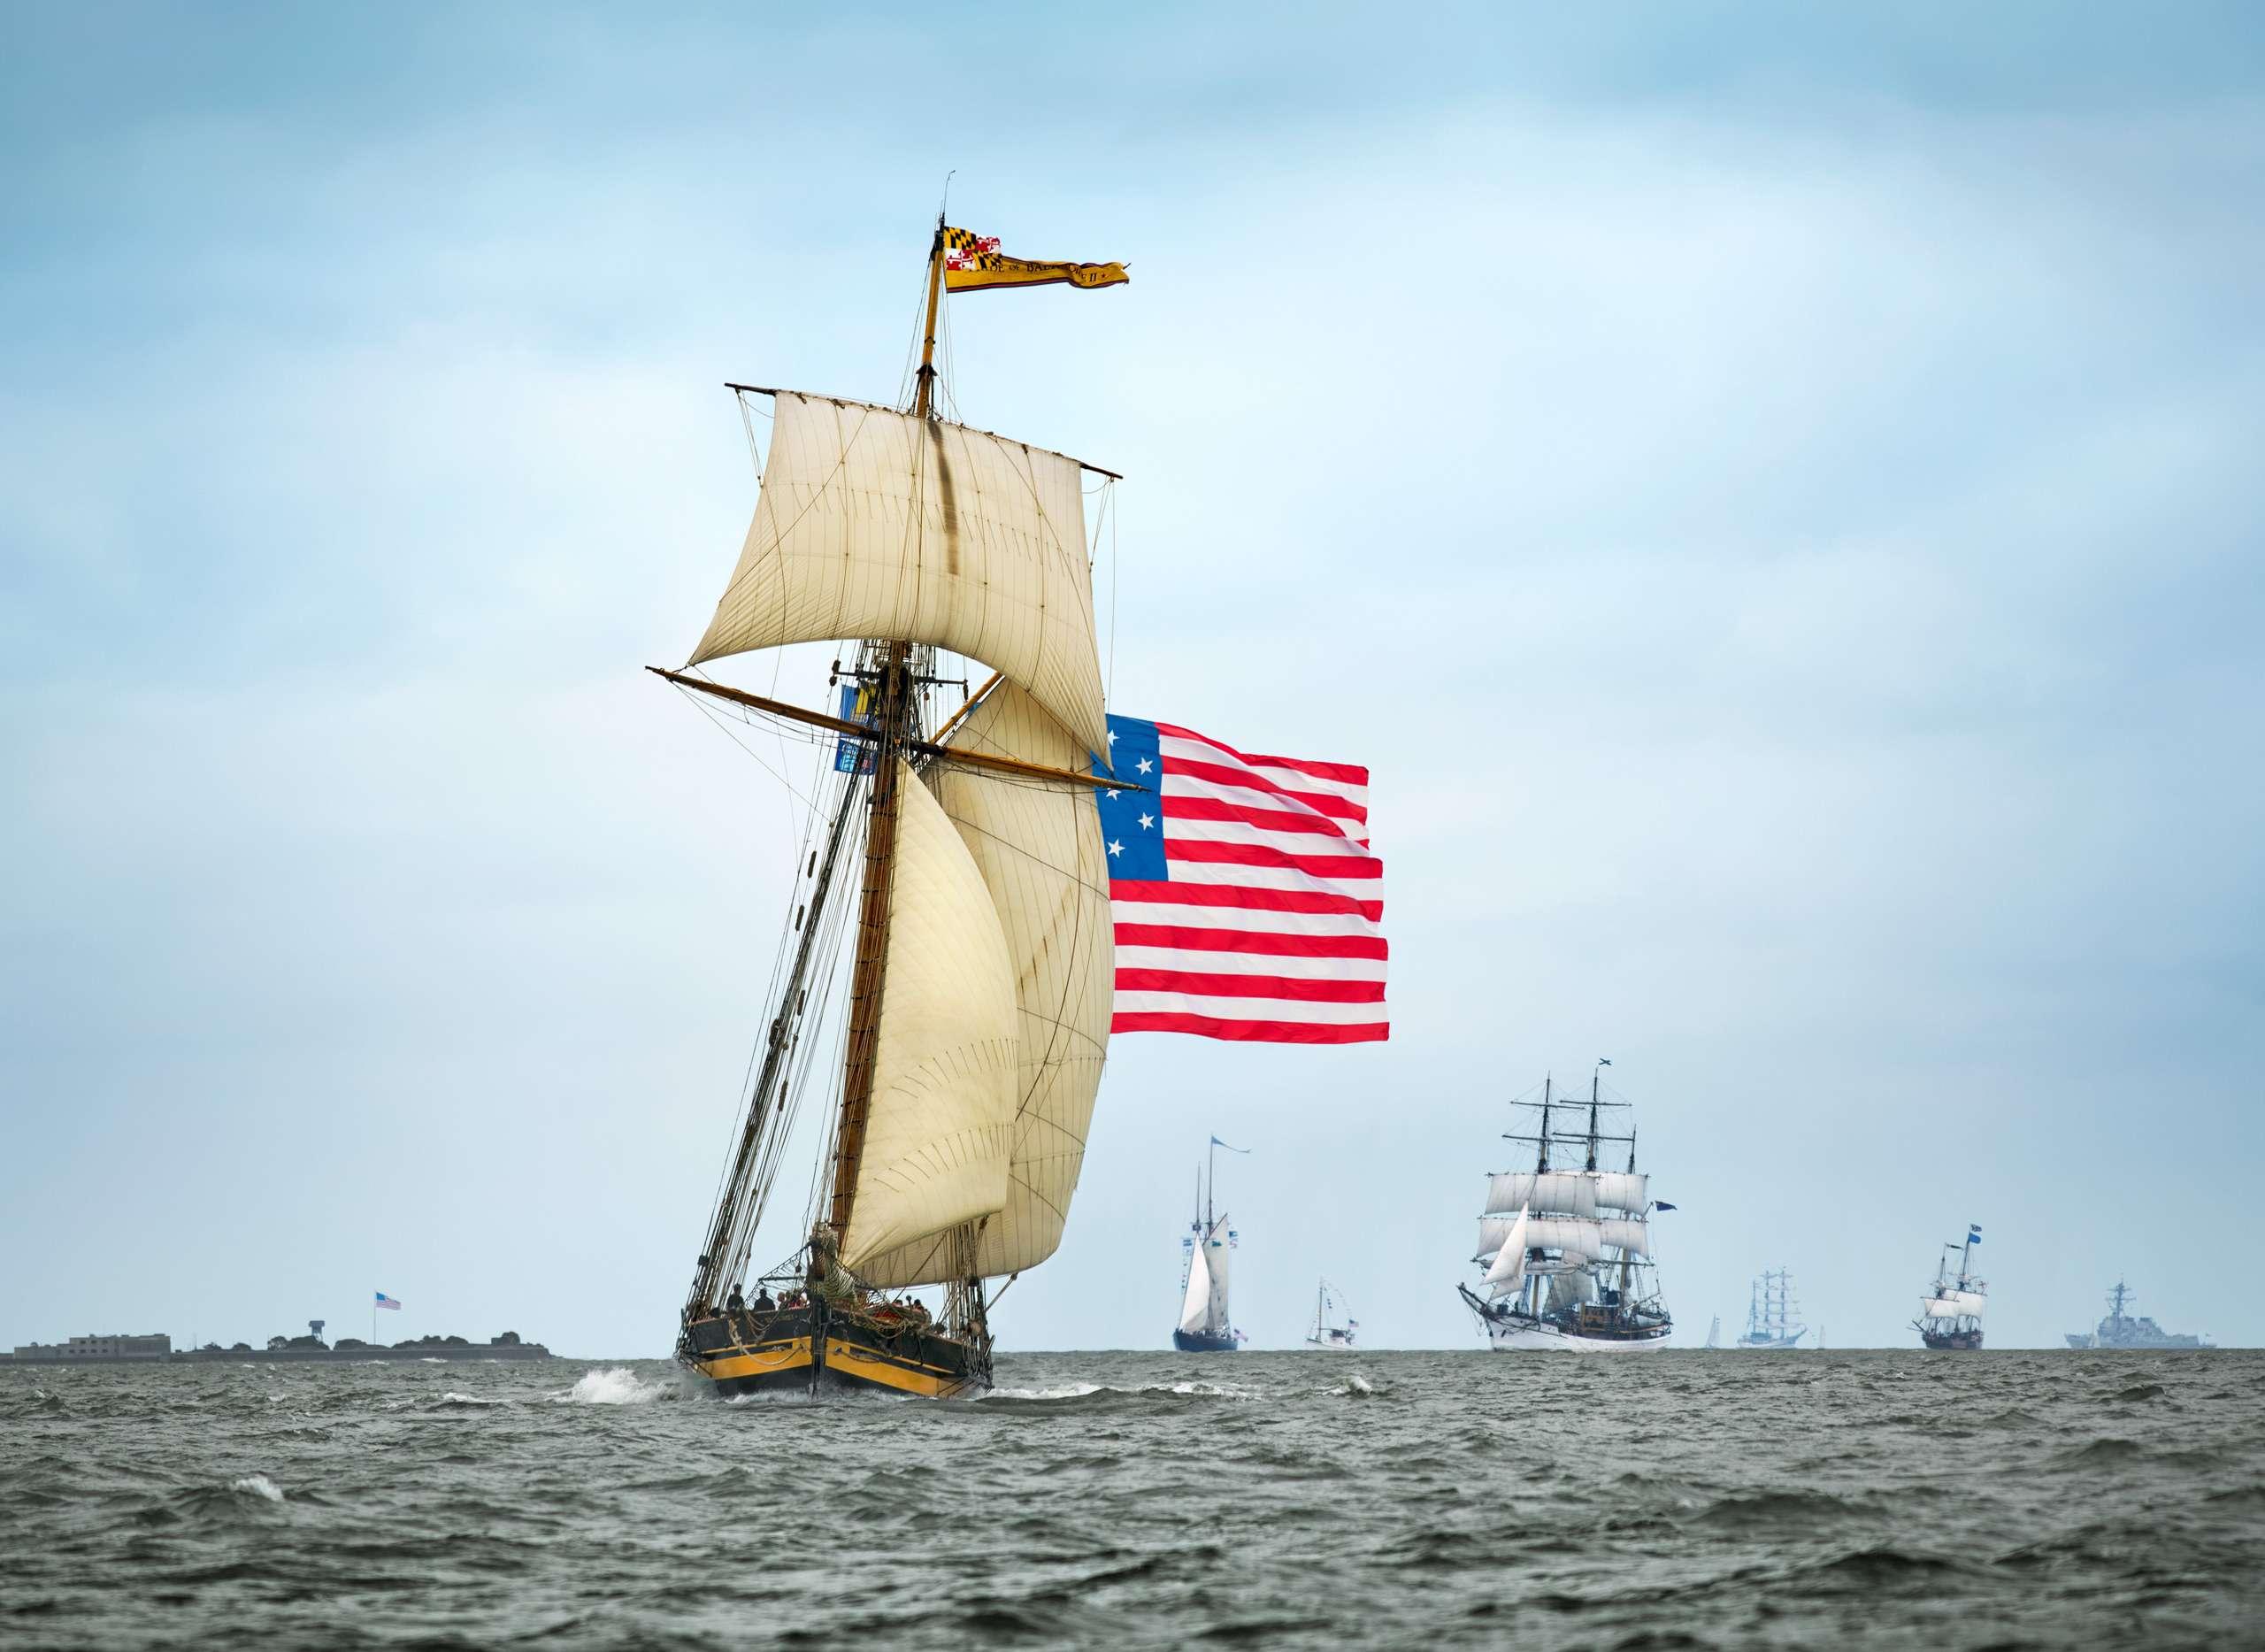 PORTFOLIO - Sailing - Windjammers #3    PCG685